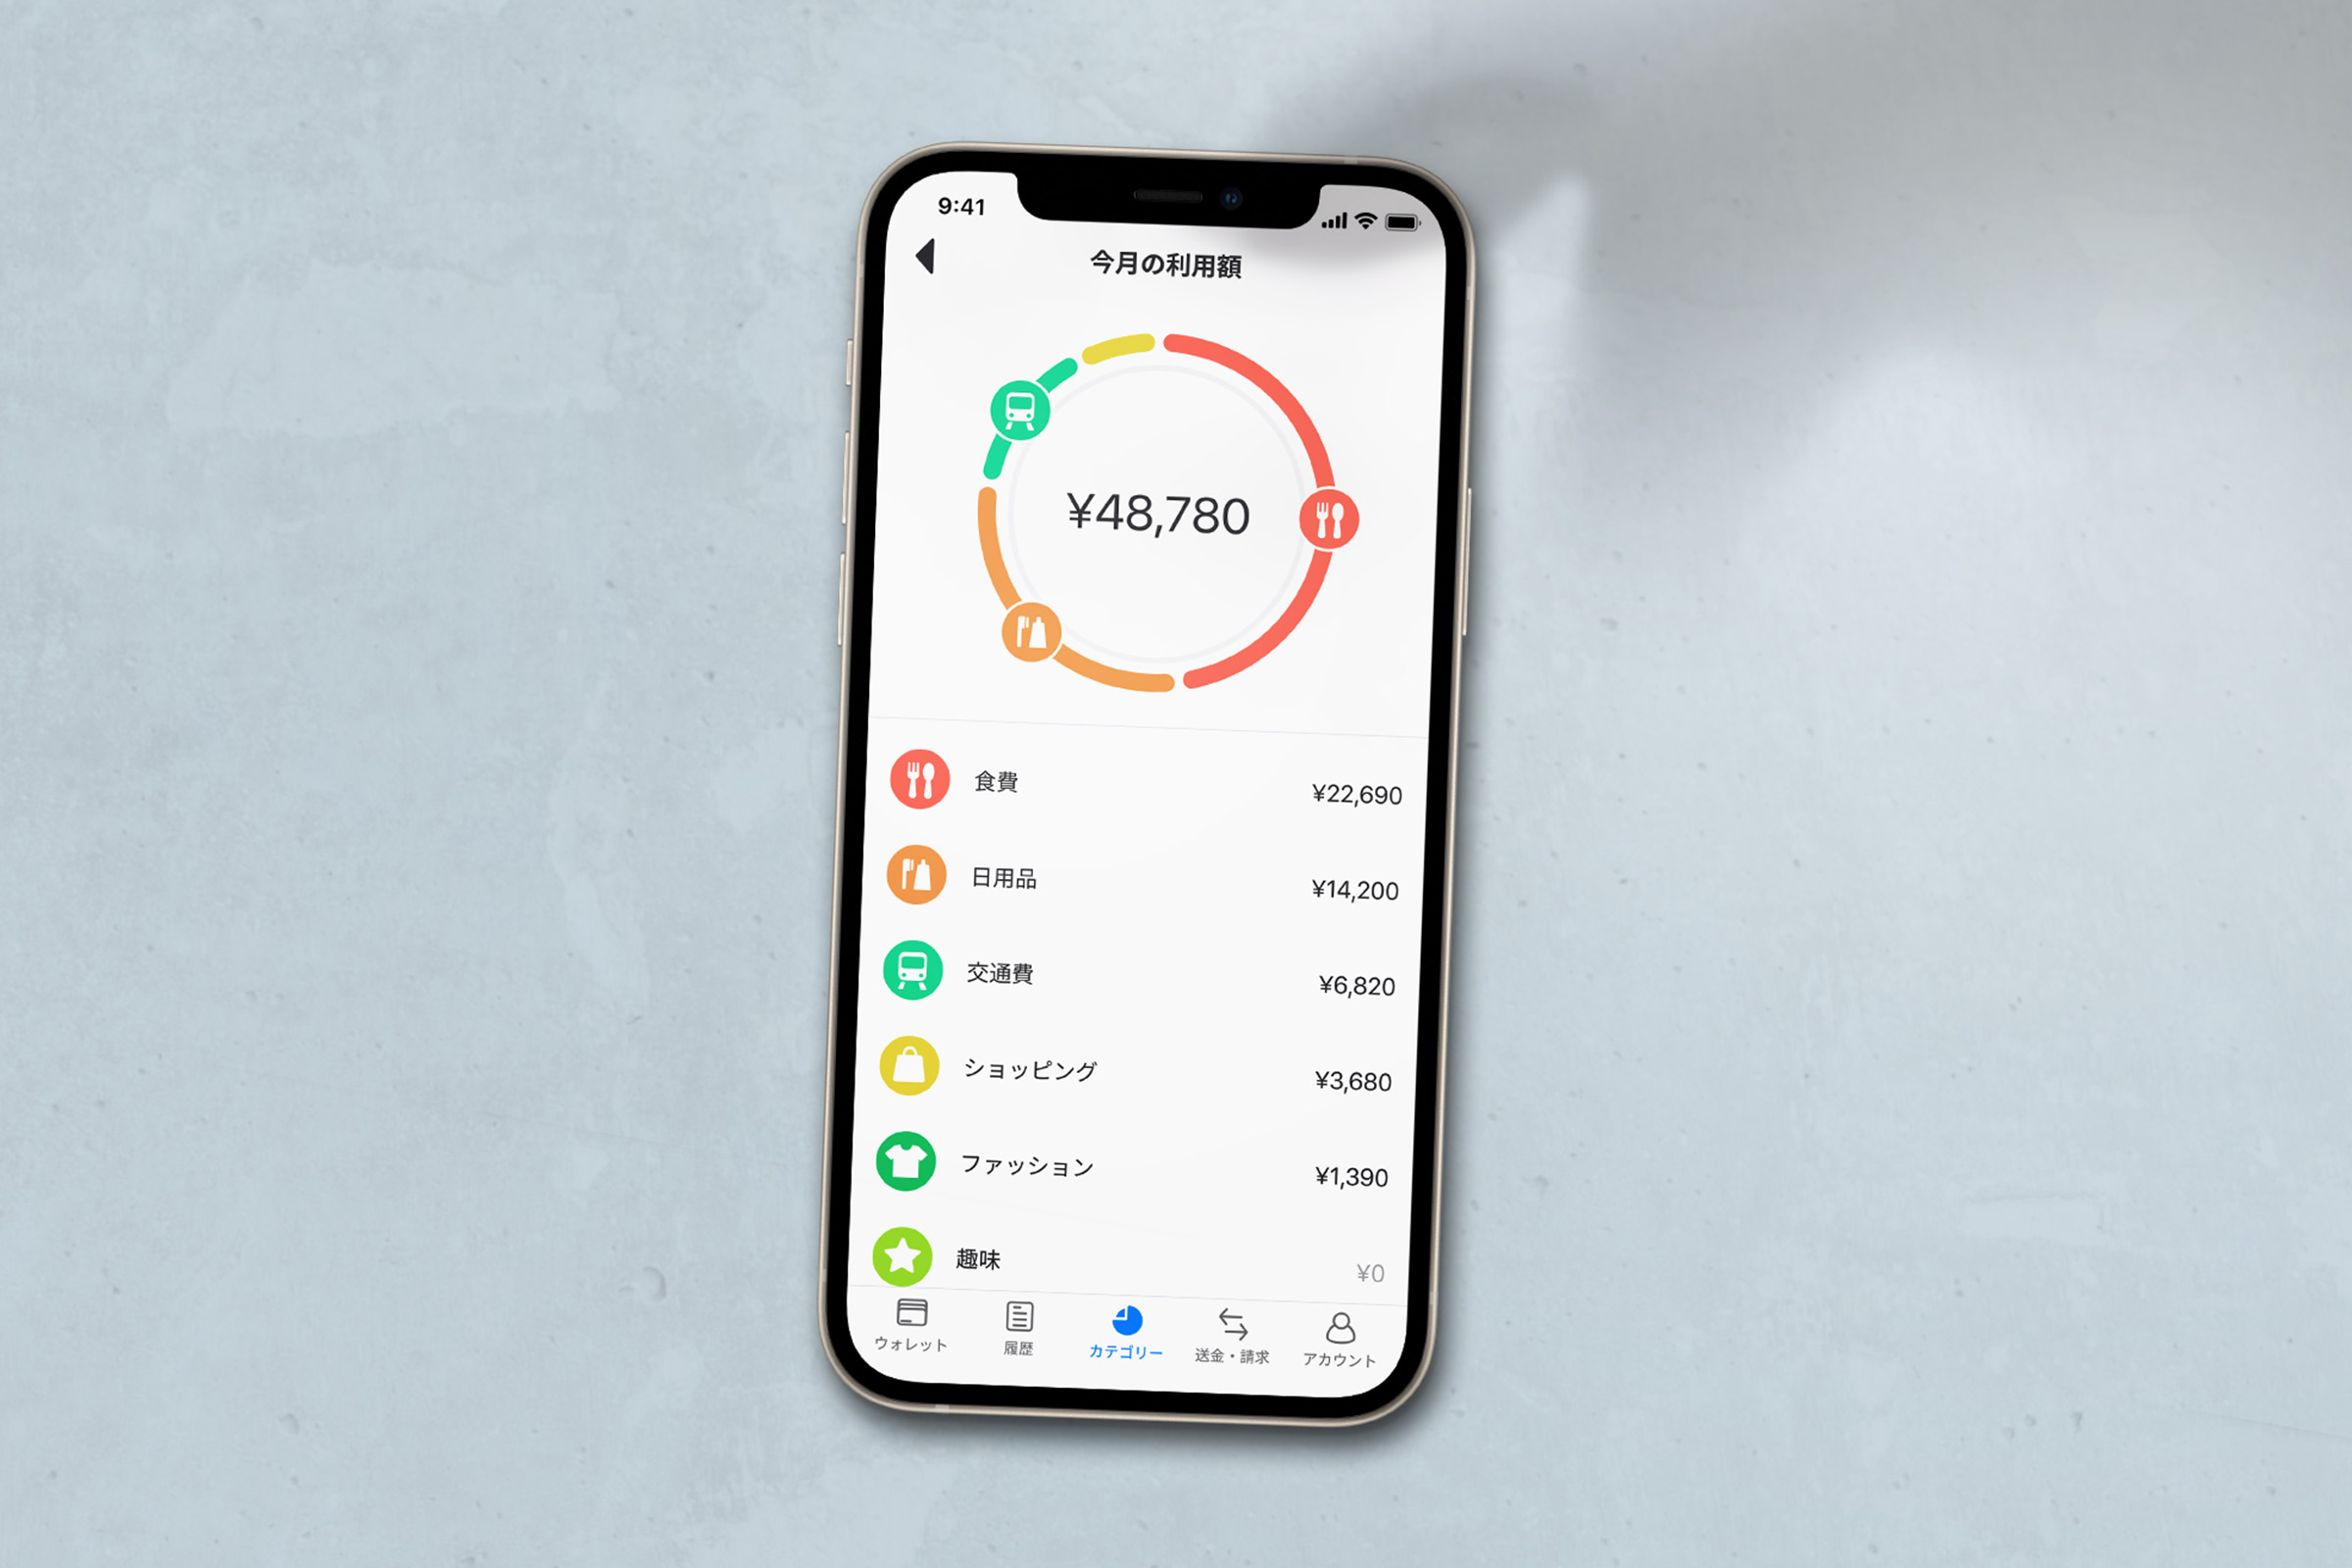 Kyashアプリのカテゴリー機能UI 支出の傾向が円グラフでわかる